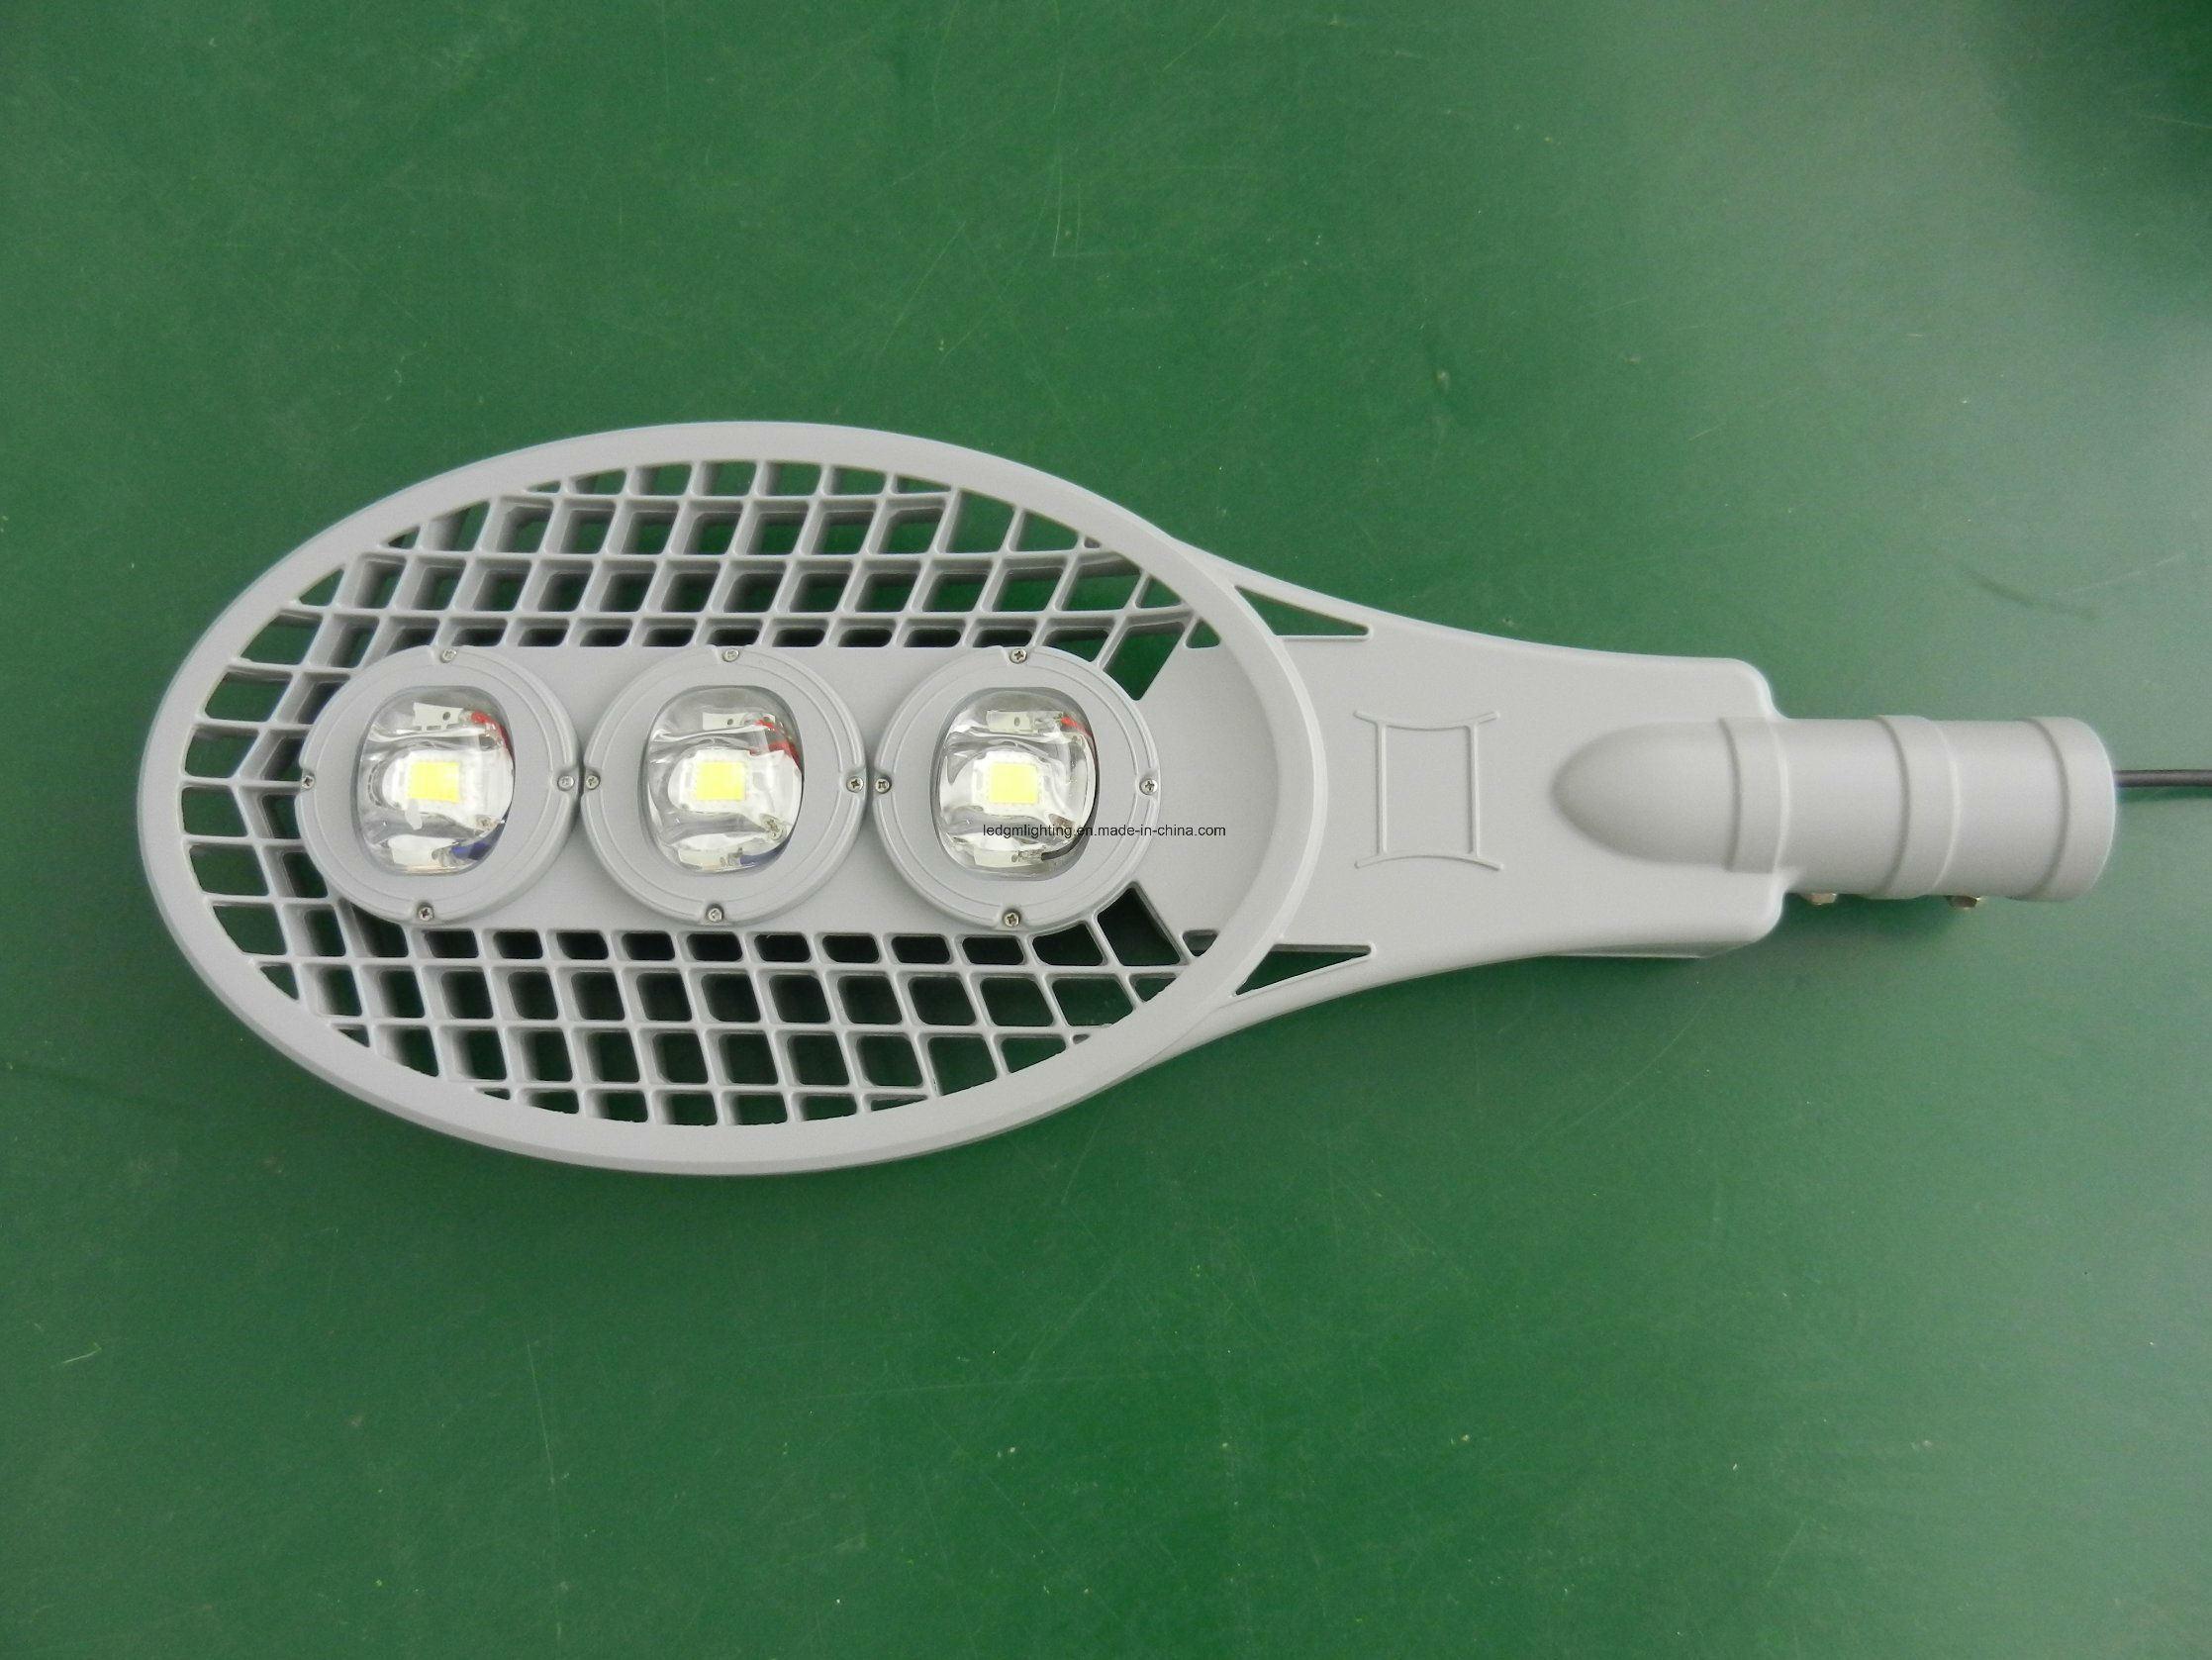 3 Years Warranty Ce EMC LVD RoHS FCC Road Lighting Project Streetlamp 180W 150W 120W 100W 60W 50W LED Street Light